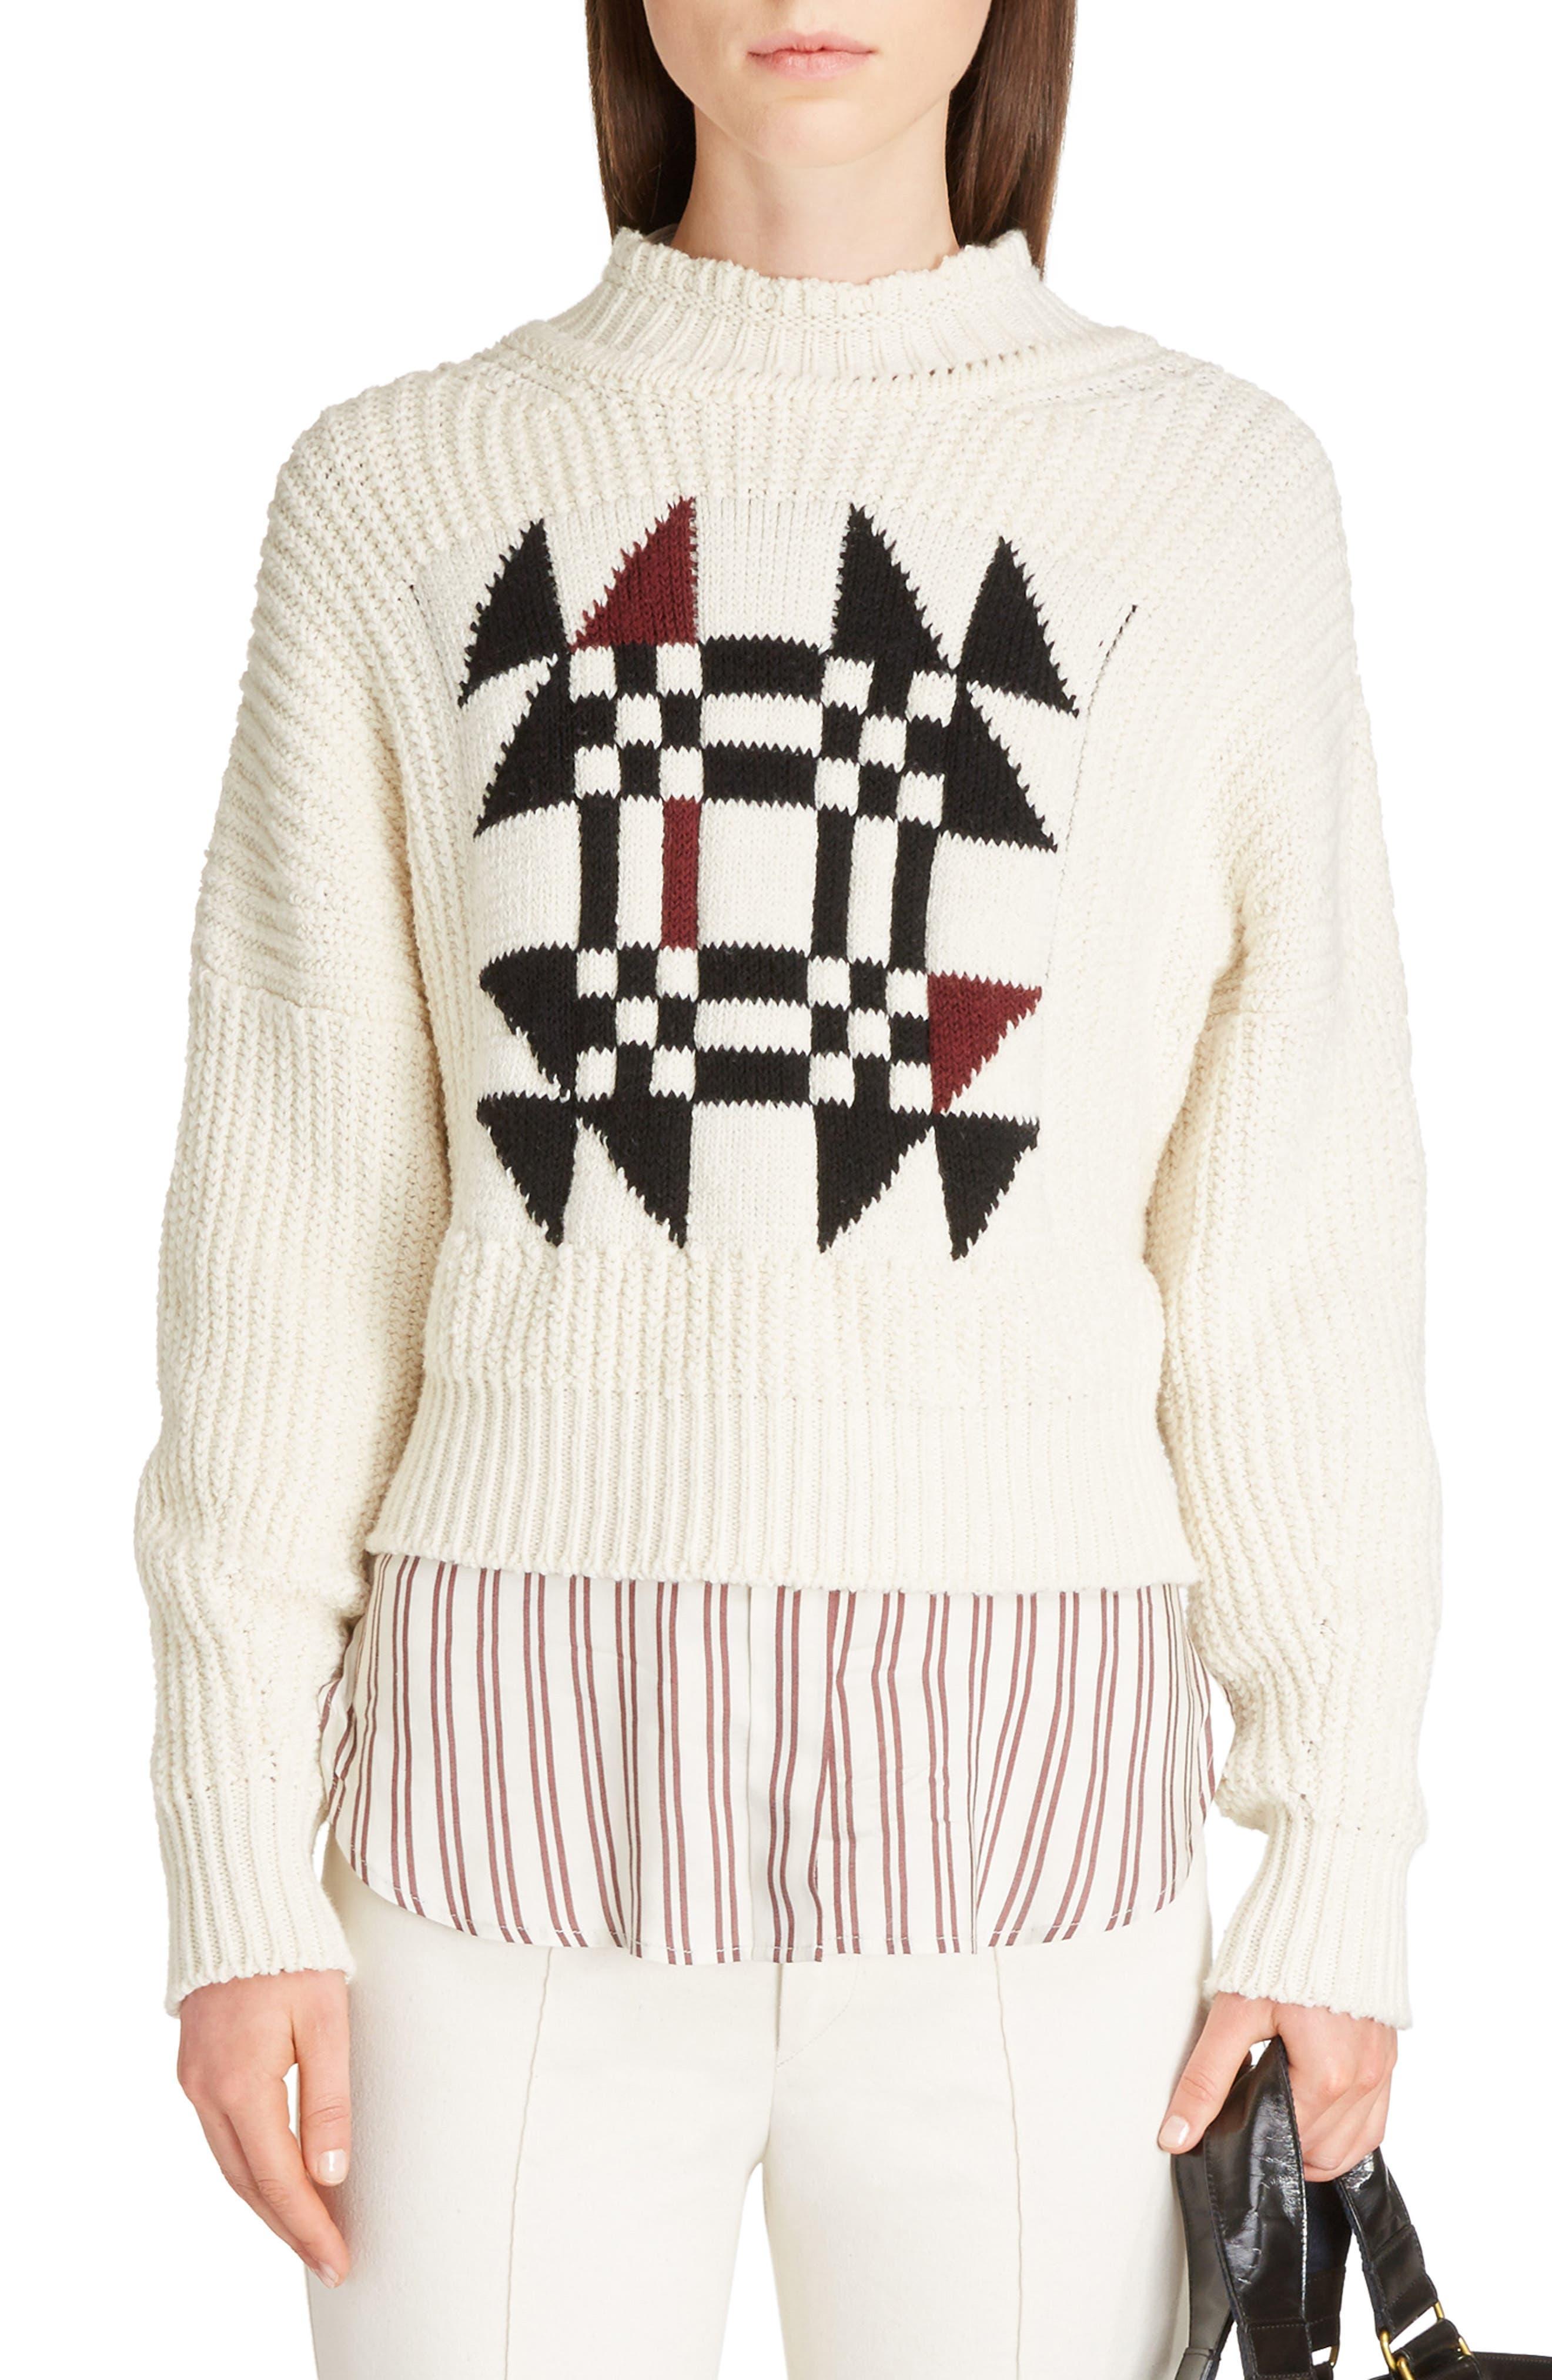 Lawrie Origami Cotton & Wool Blend Sweater,                         Main,                         color, Ecru